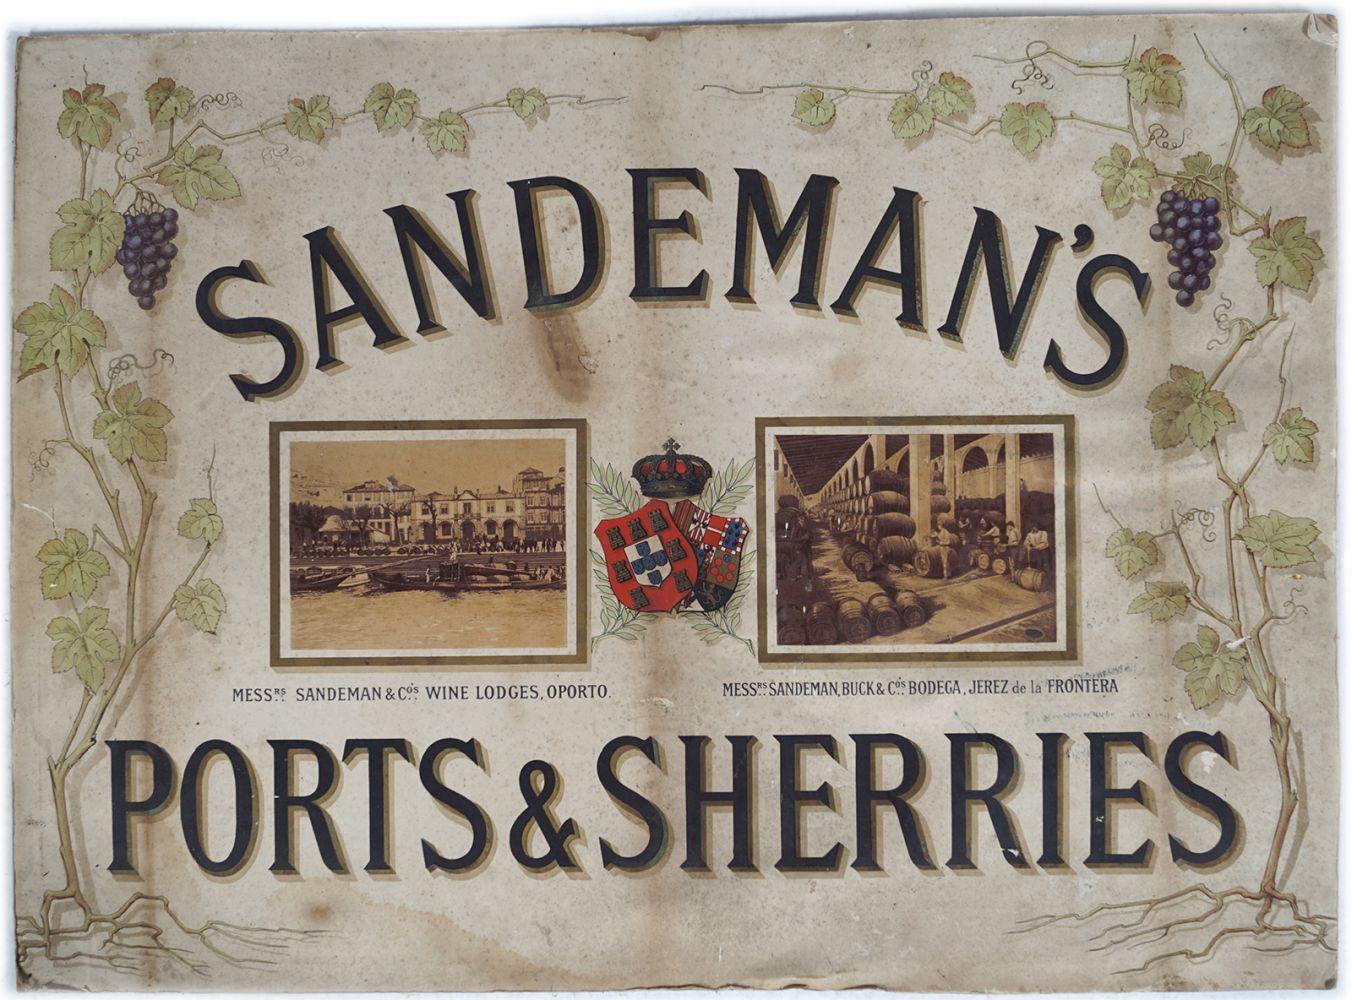 SANDEMAN'S PORTS & SHERRIES ORIGINAL POSTER